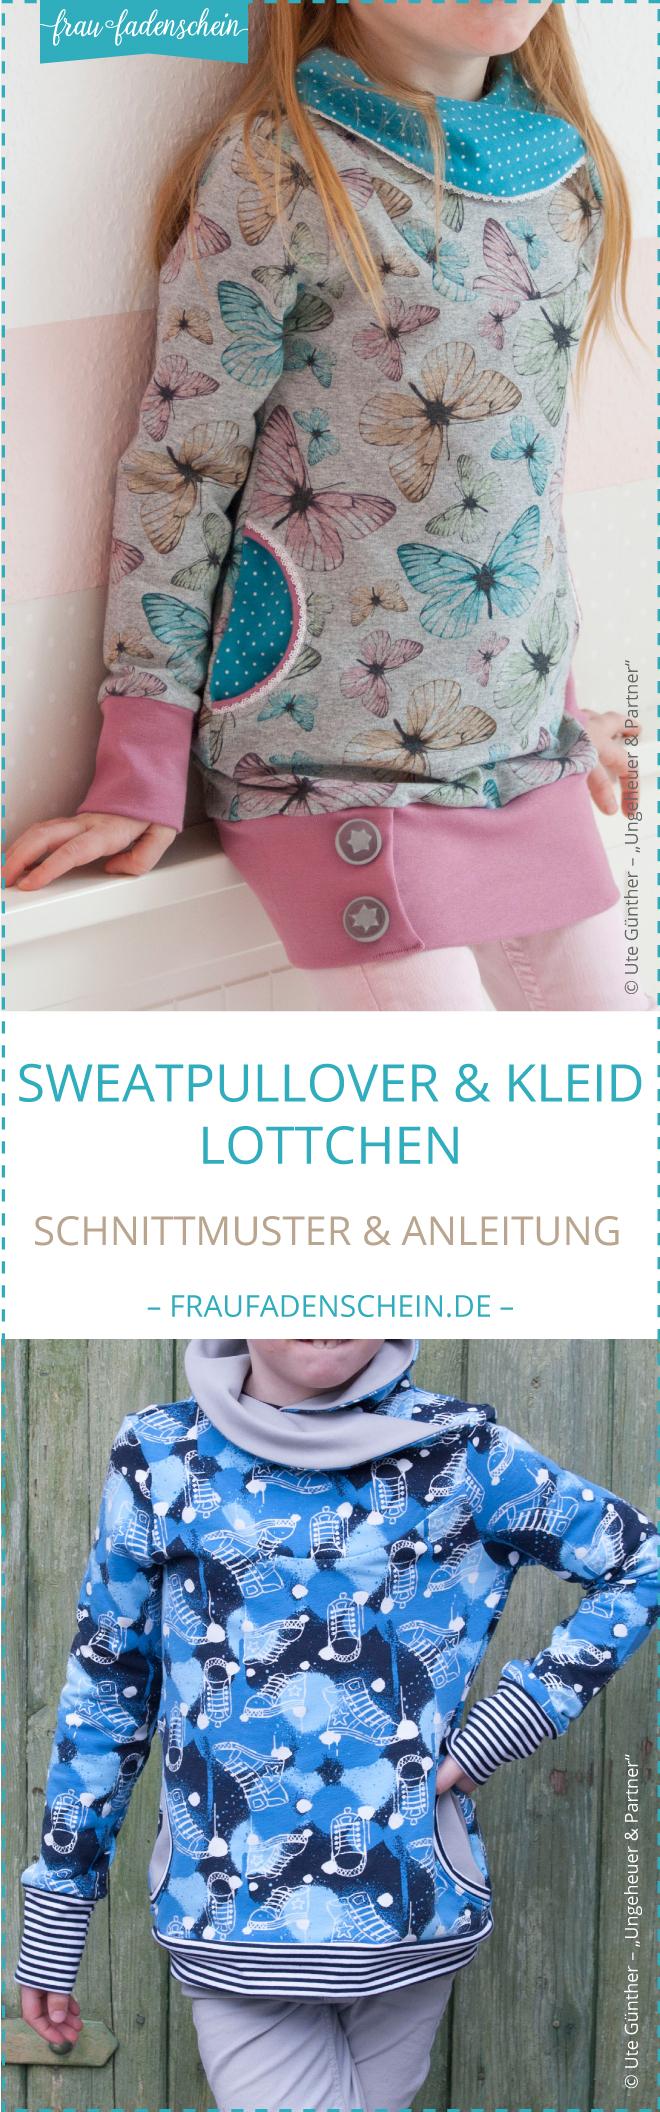 Sweatpullover & -kleid Lottchen